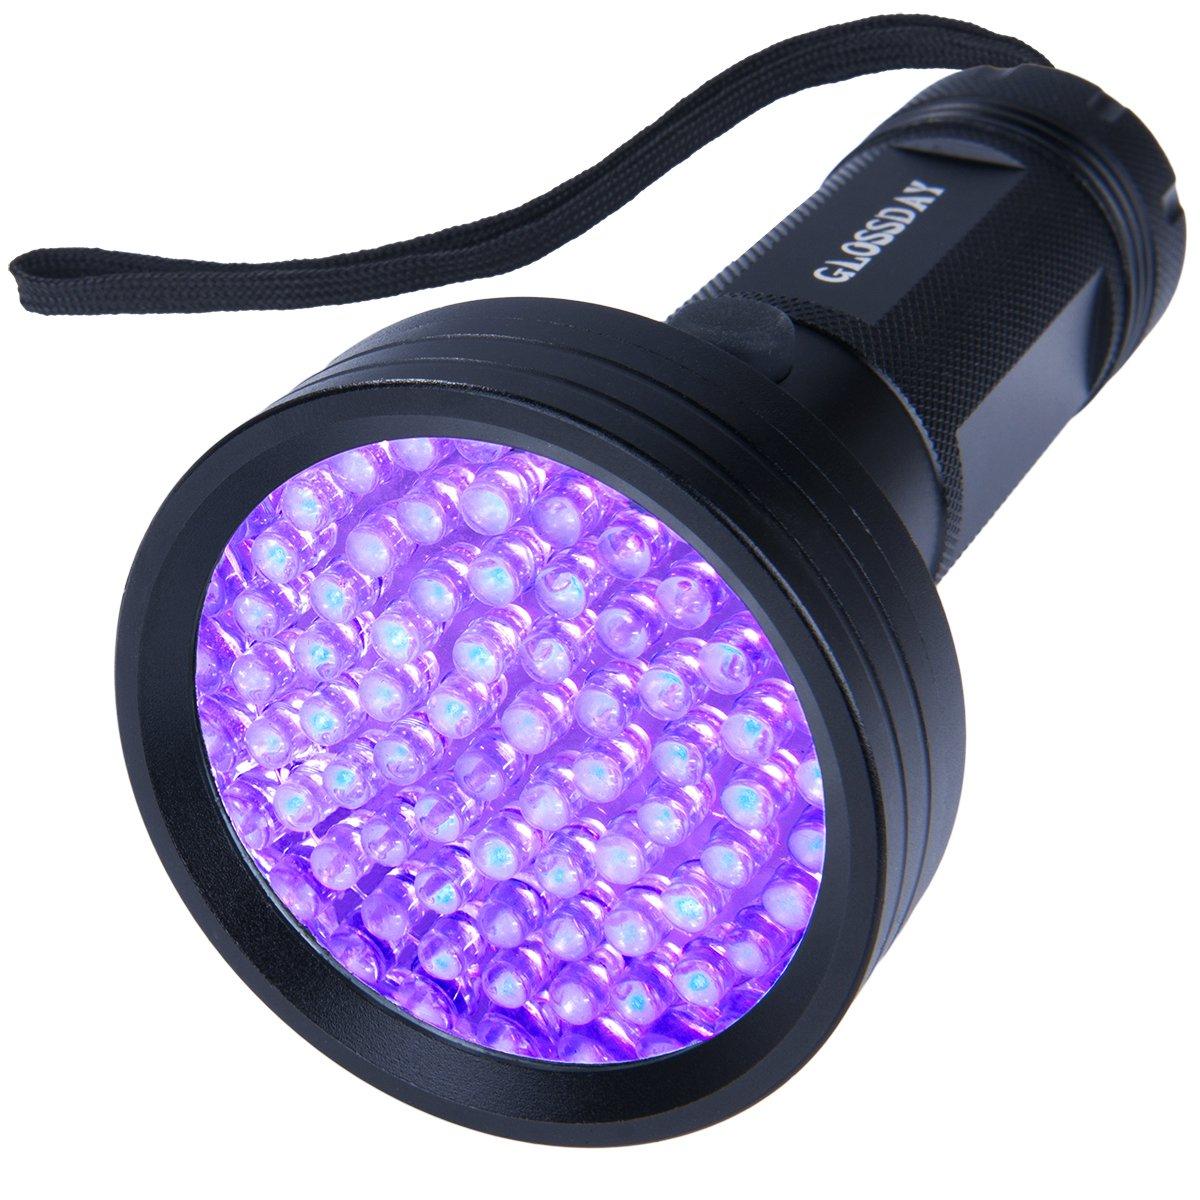 Best Black Light Flashlights For Scorpions Amazon Com